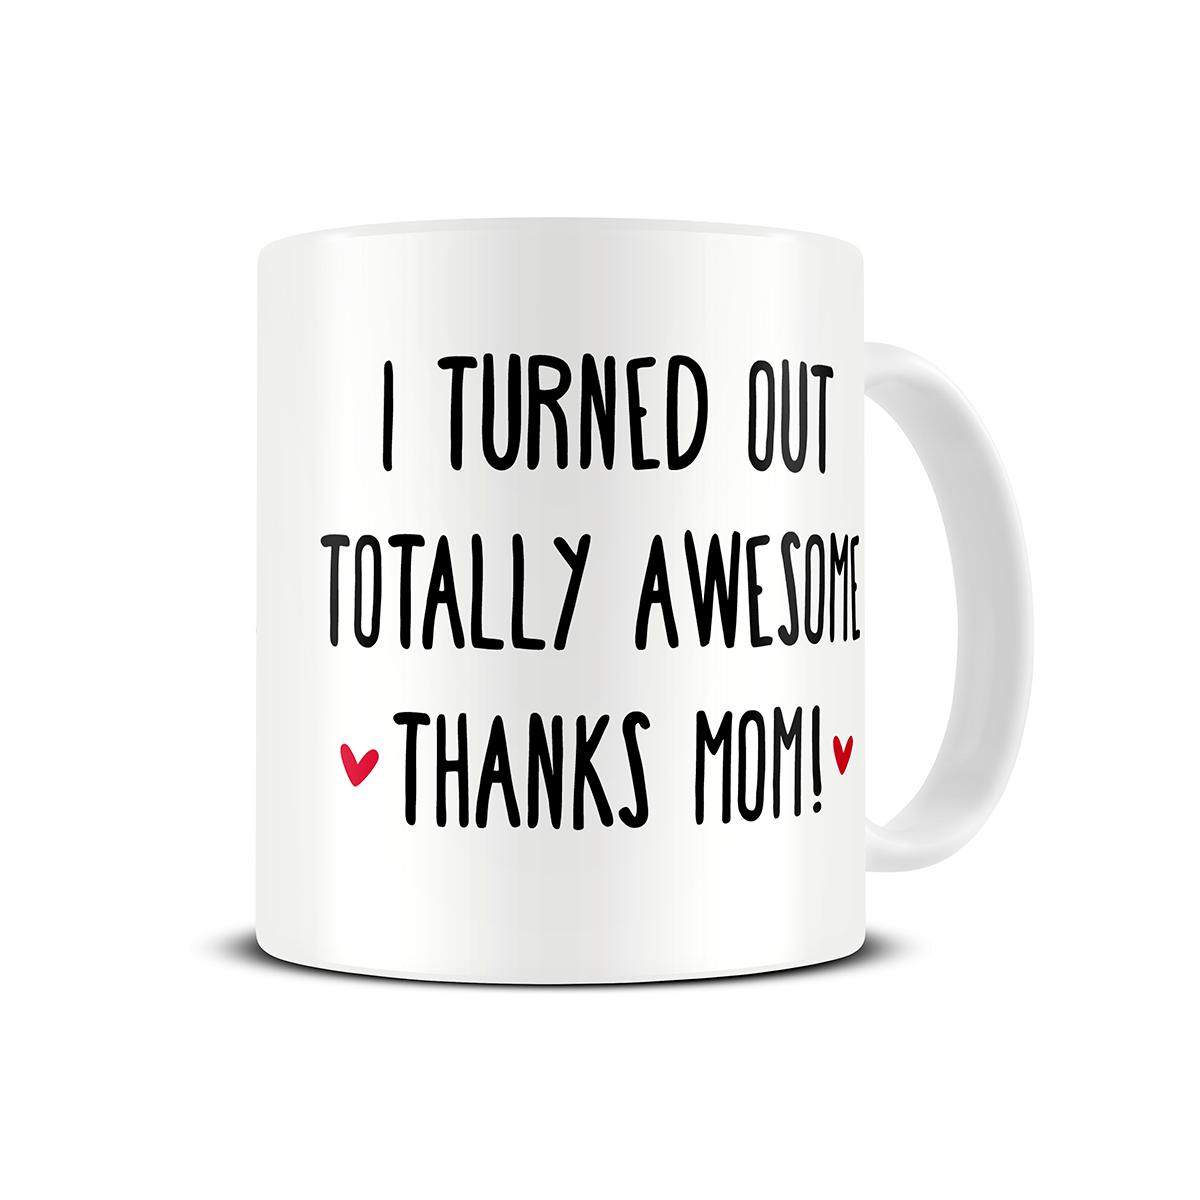 i-turned-out-awesome-thanks-mom-mug